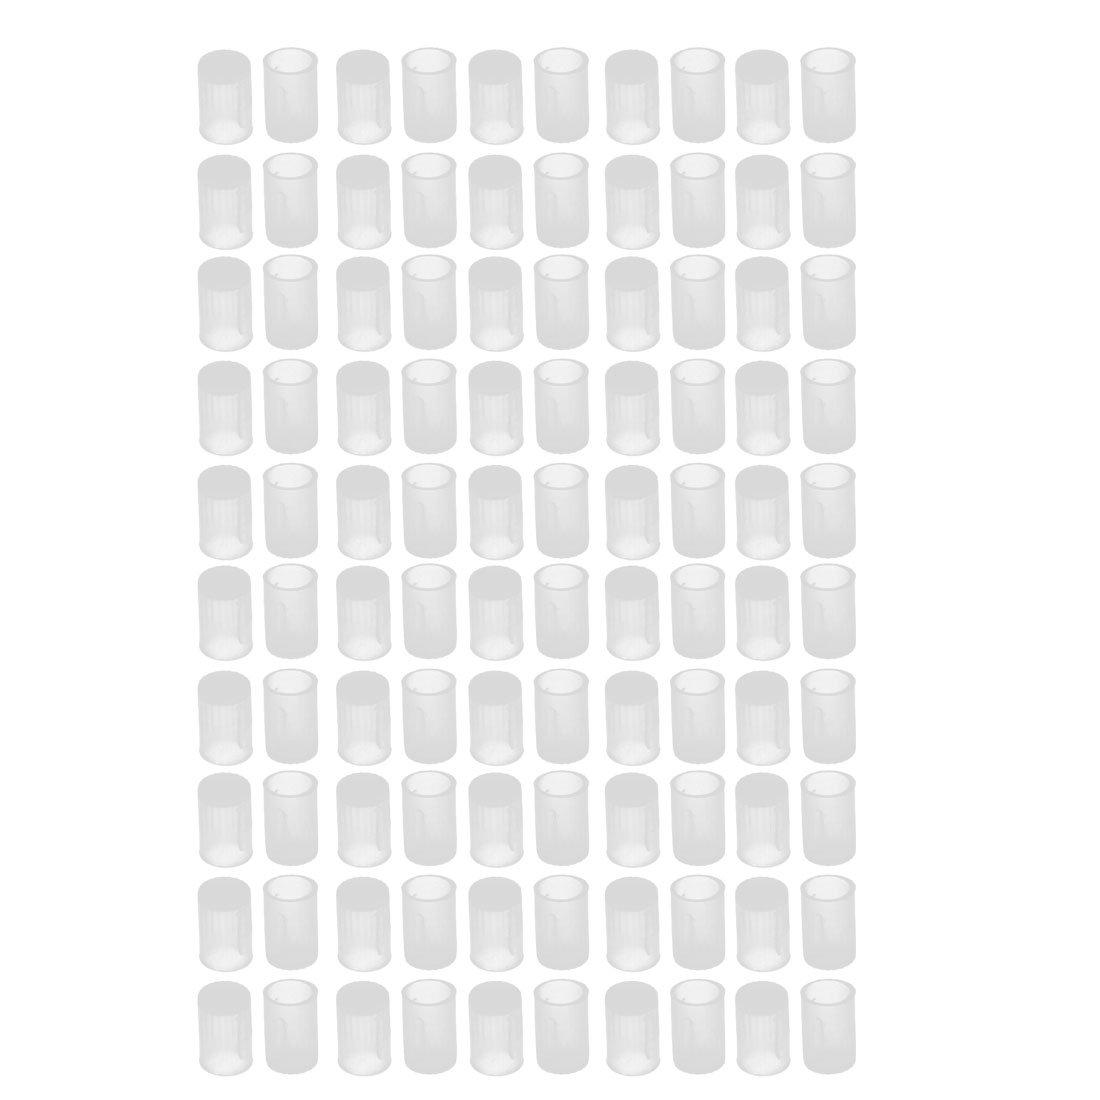 uxcell 100Pcs 6mm Inner Dia PE Plastic End Cap Bolt Thread Protector Tube Cover